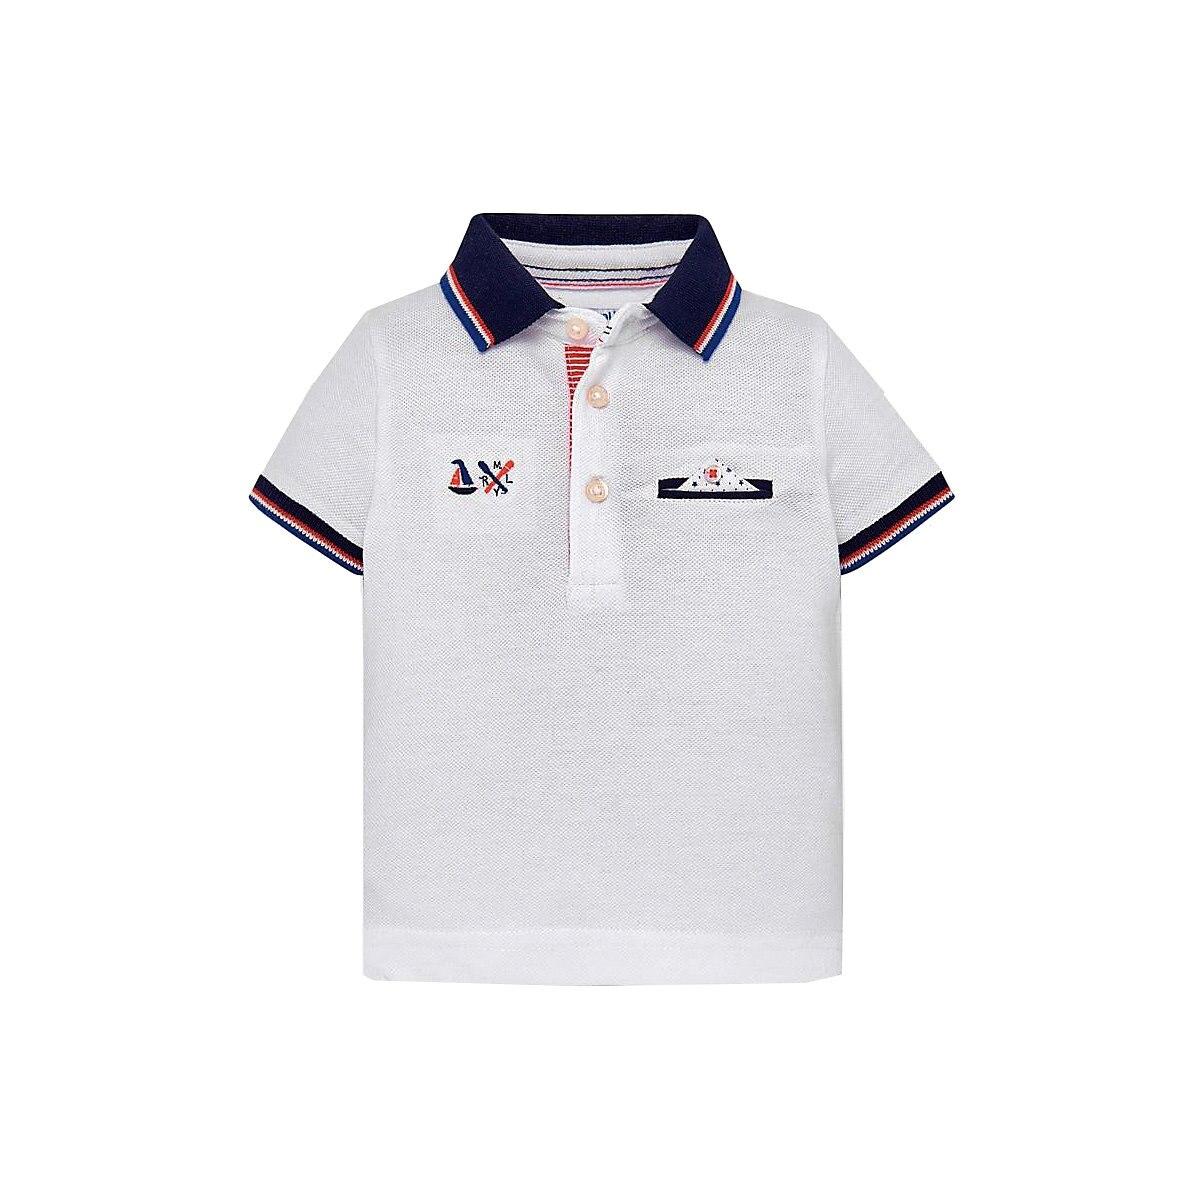 MAYORAL Polo Shirts 10687164 children clothing t-shirt shirt the print for boys